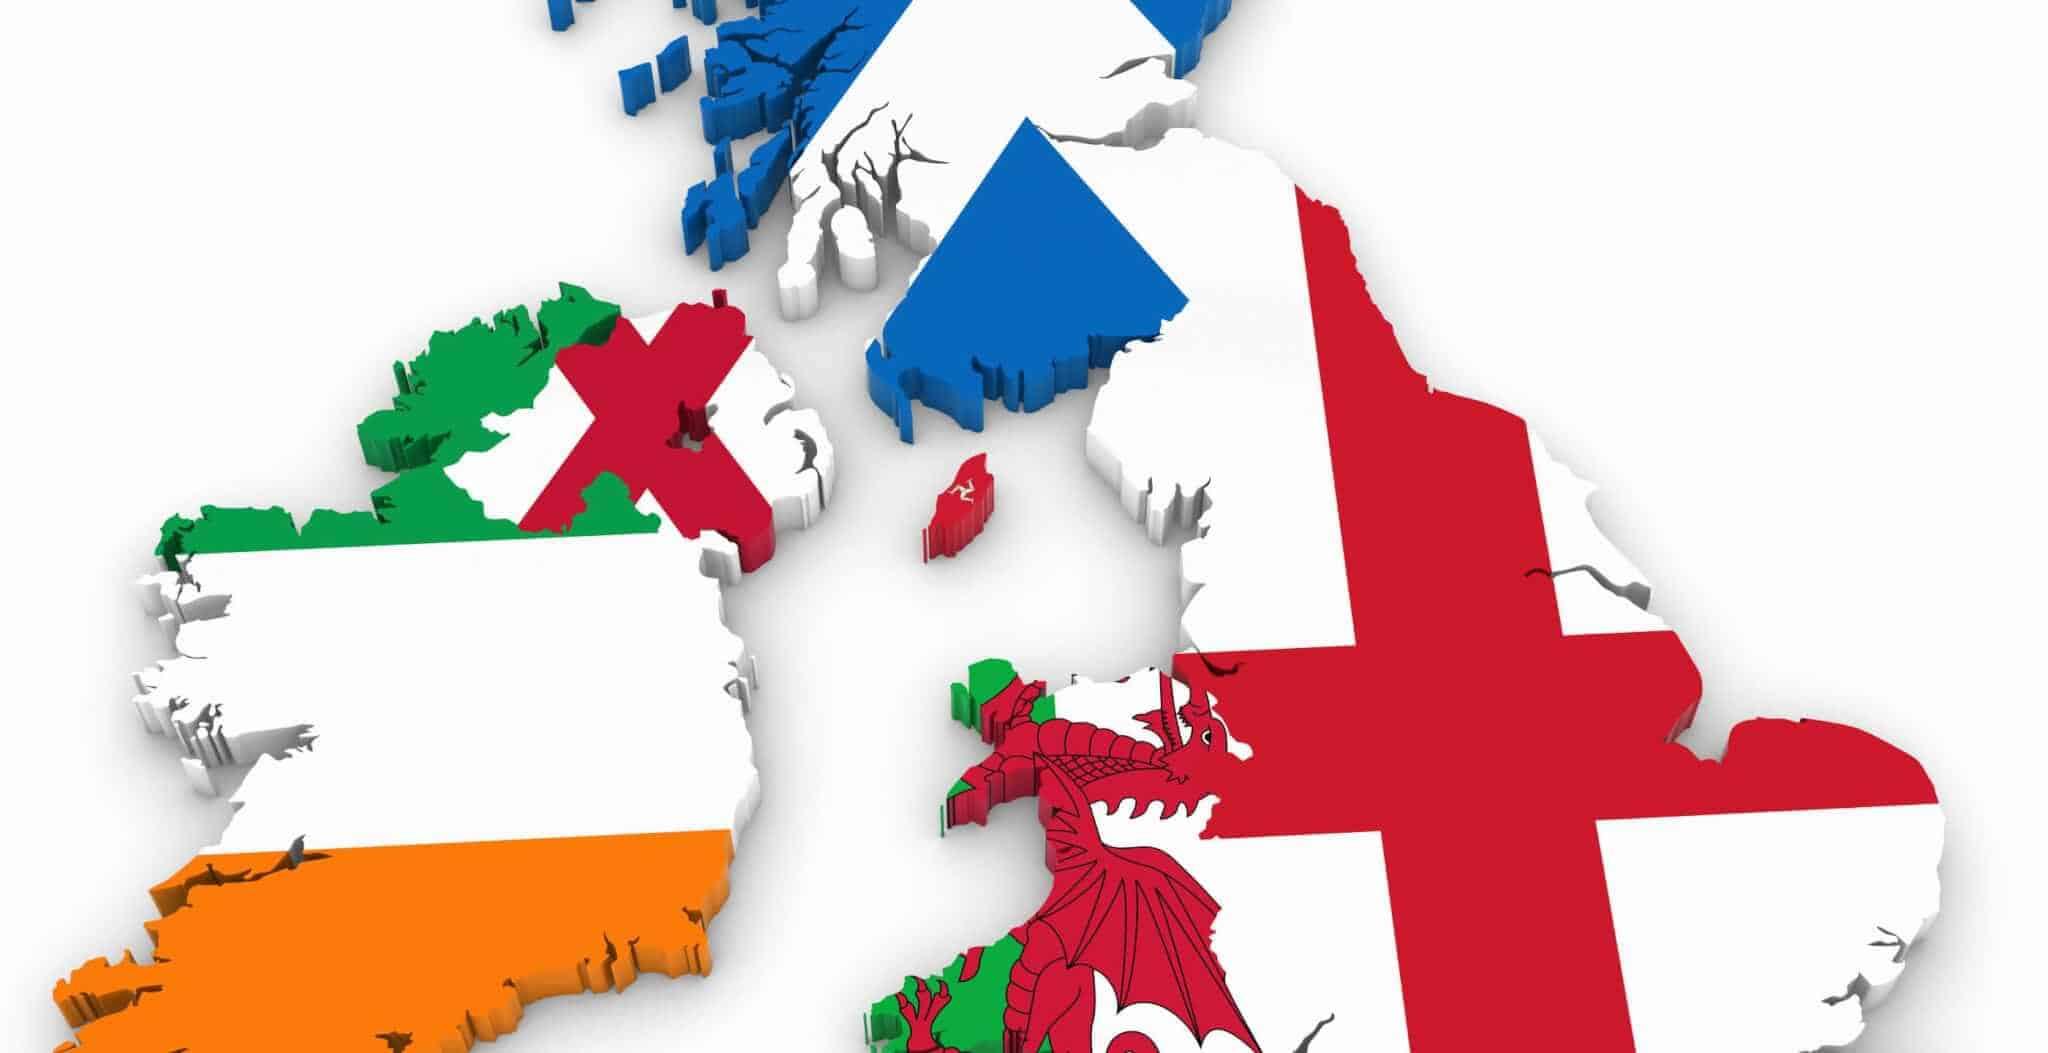 The UK, Britain, Great Britain, The British Isles, England.